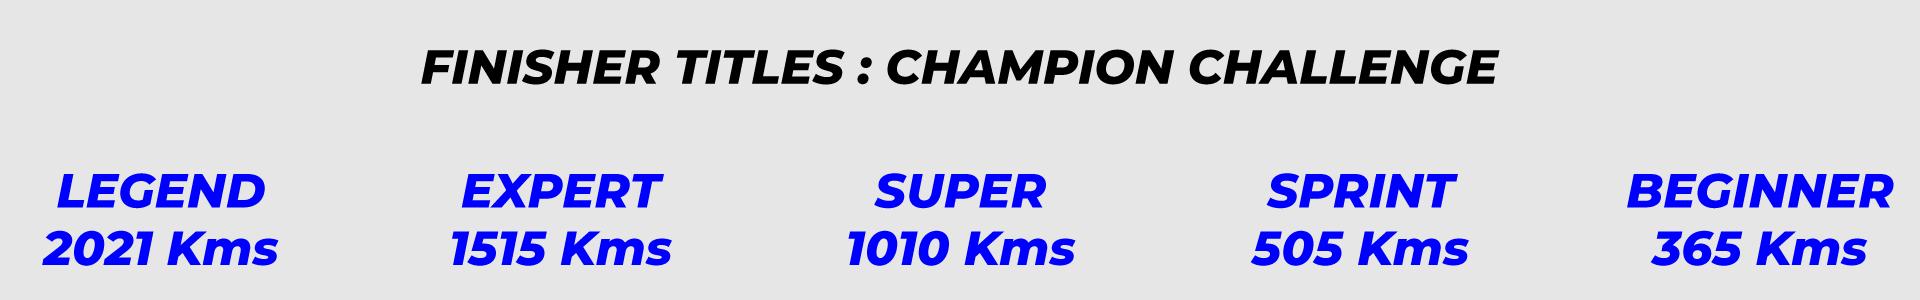 Champion-Run-2021-FInisher-Titles